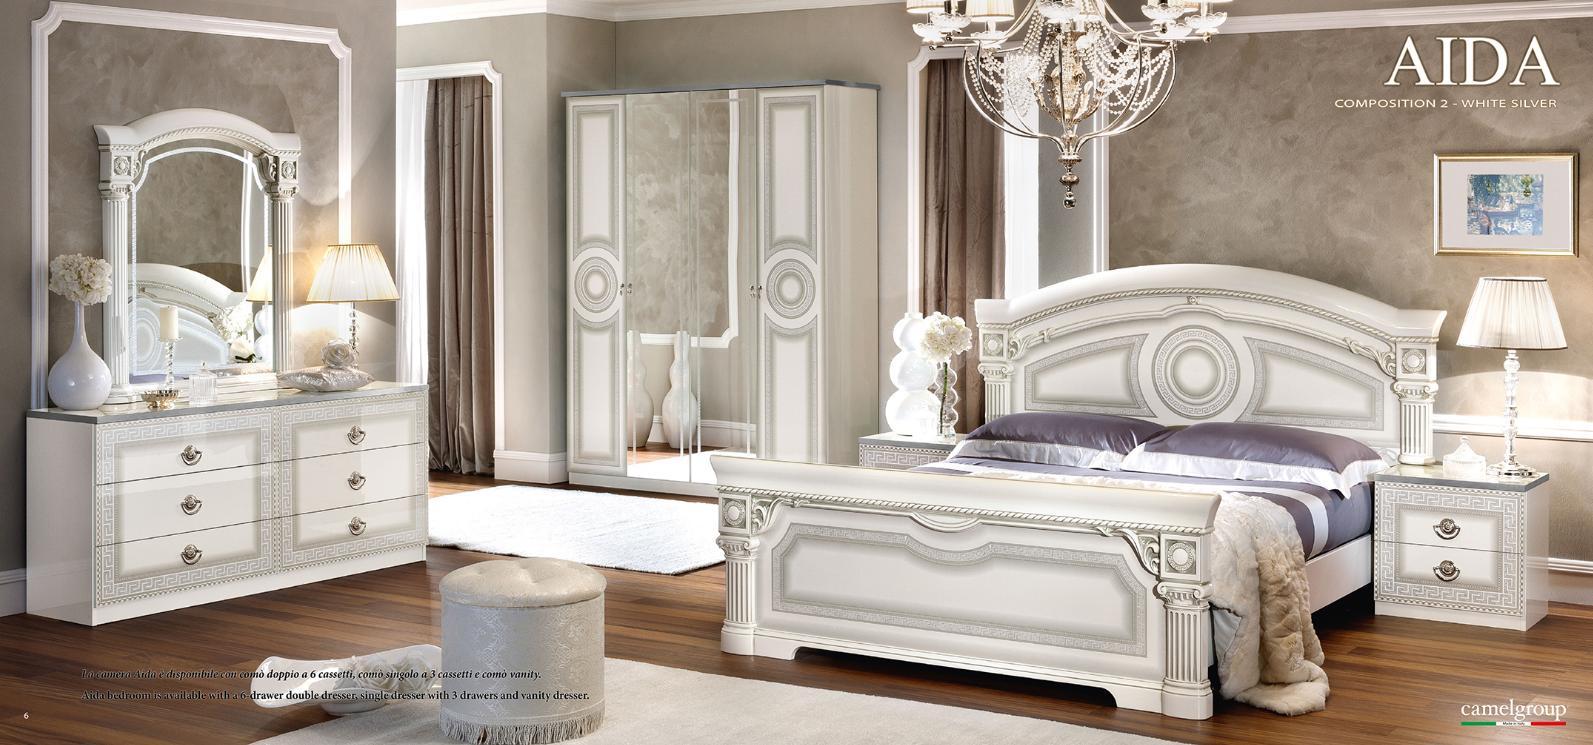 Esf Aida Glossy White Silver Finish King Platform Bedroom Set 5pcs Made In Italy Esf Aida White Silver Ek Set 5